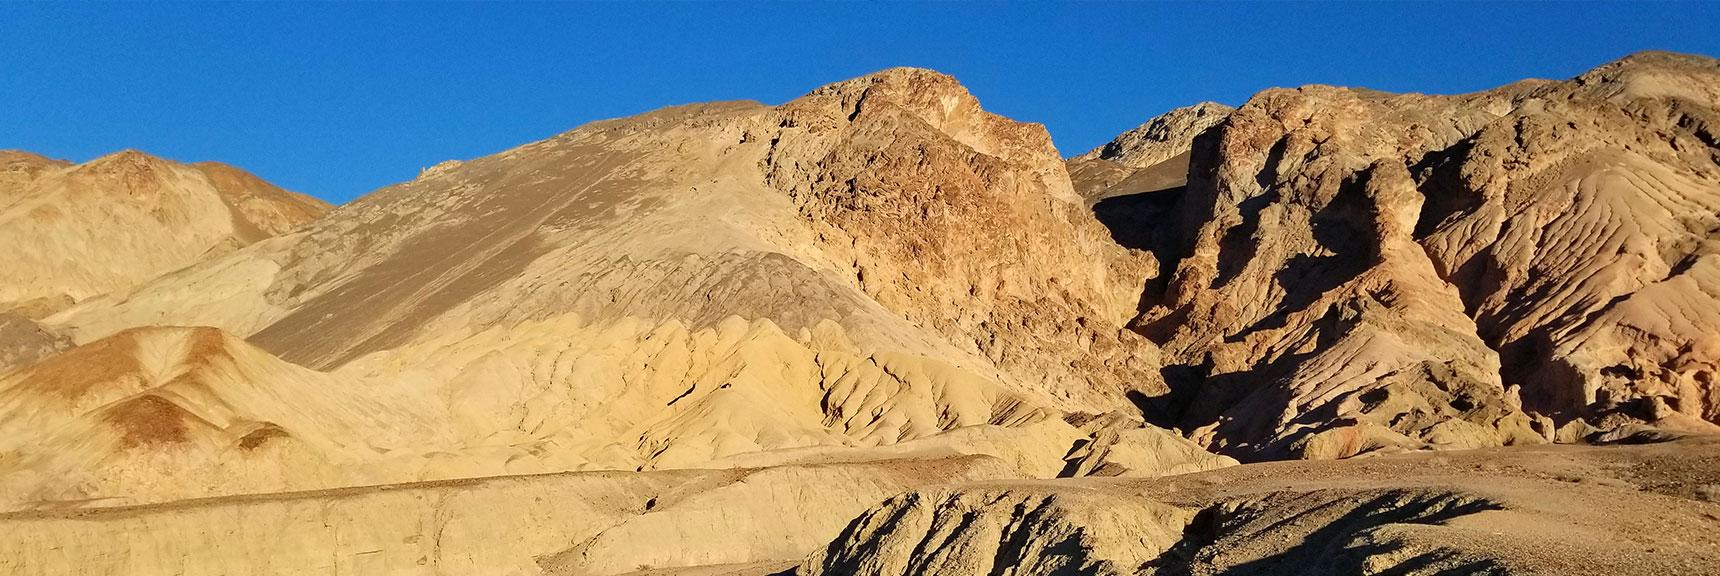 Death Valley National Park Golden Canyon November 24th 2018